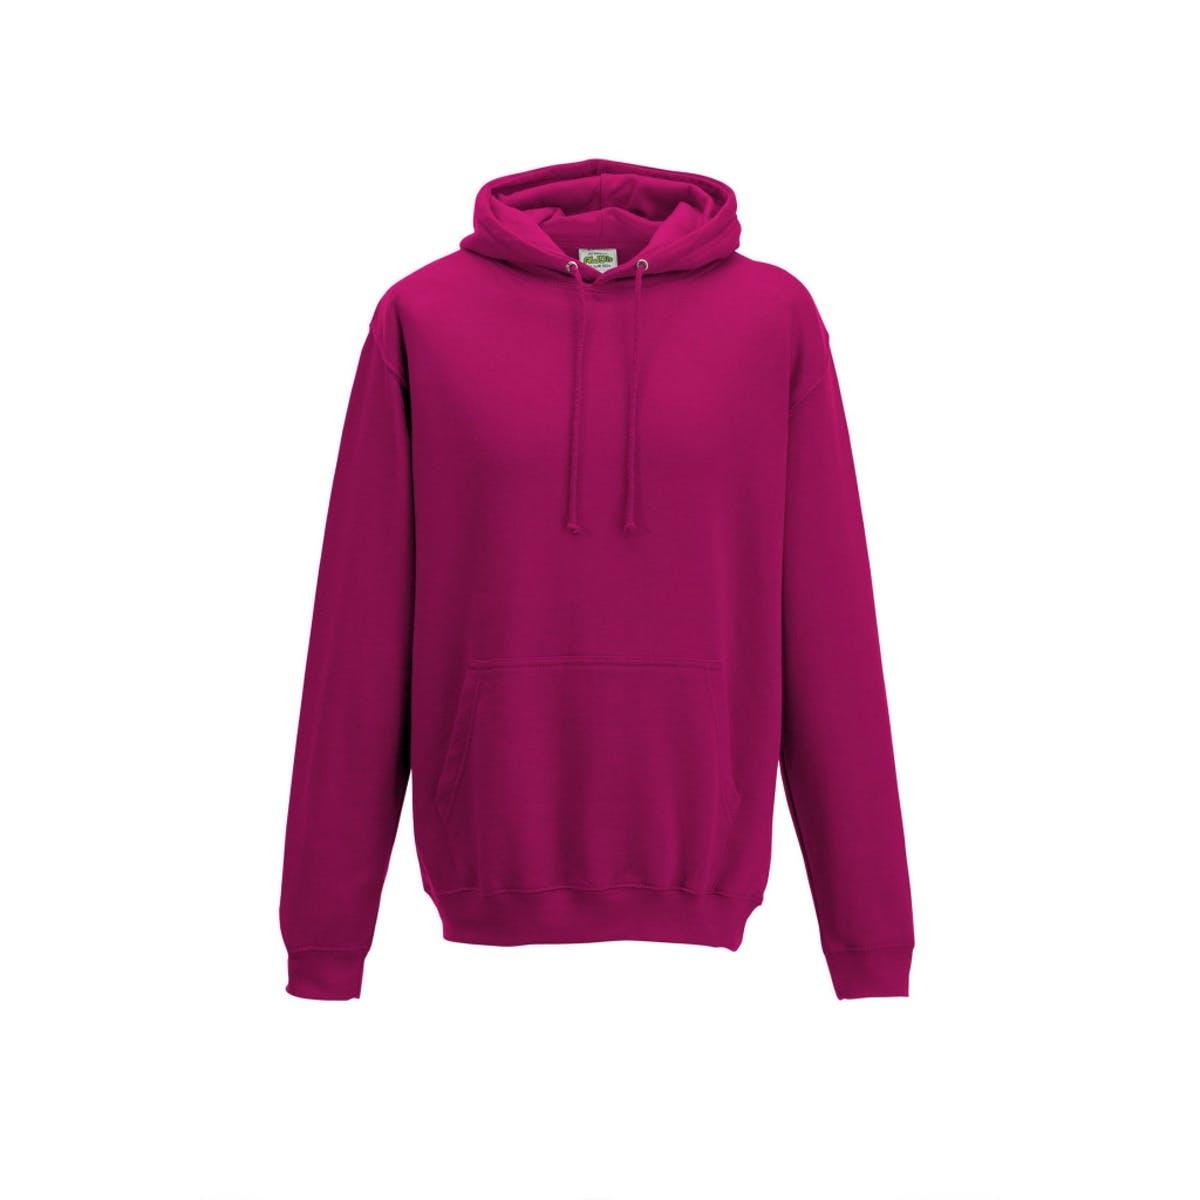 hot pink college hoodies